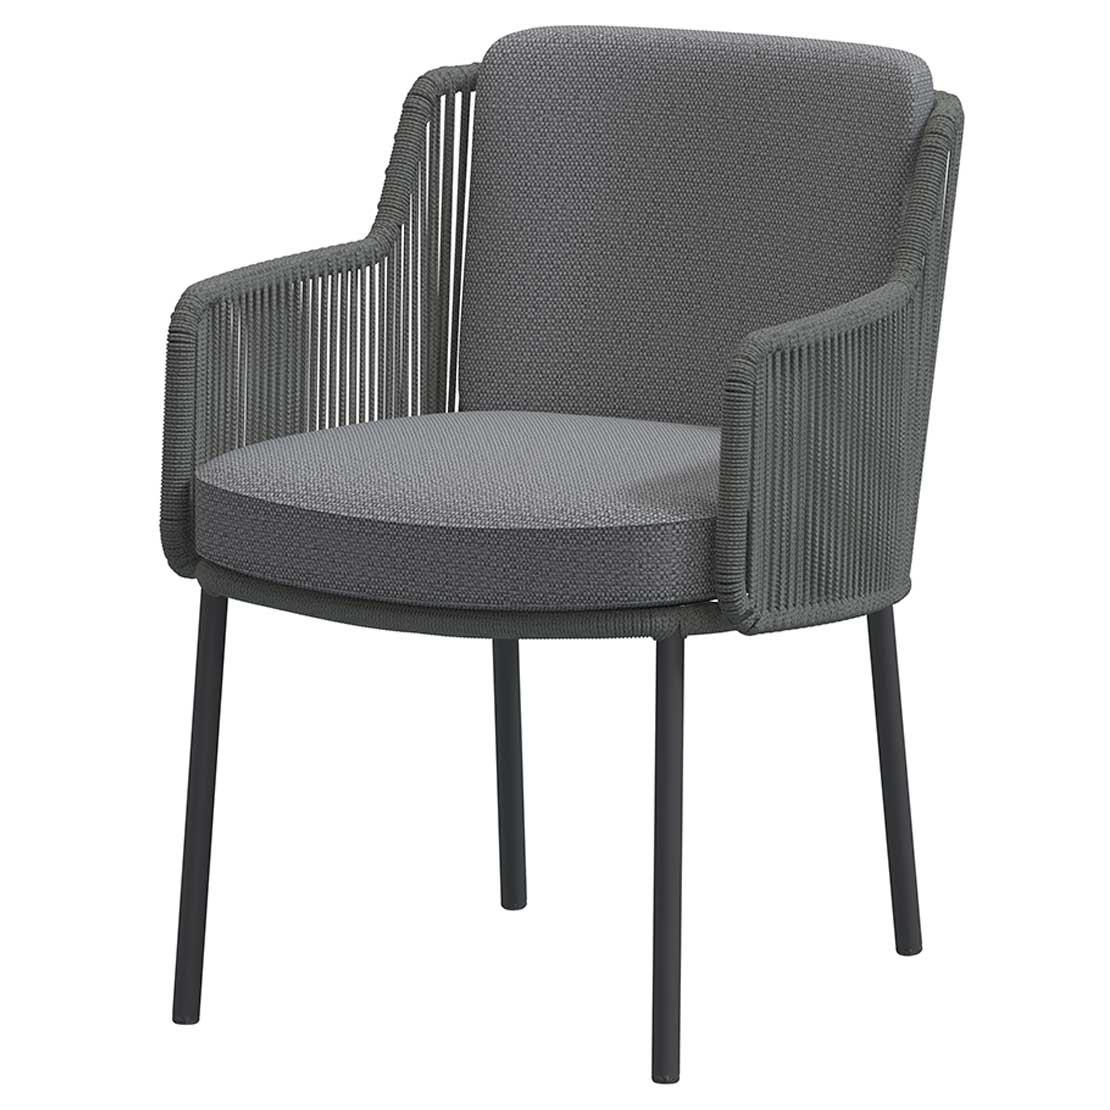 Bernini dining chair Platinum with 2 cushions